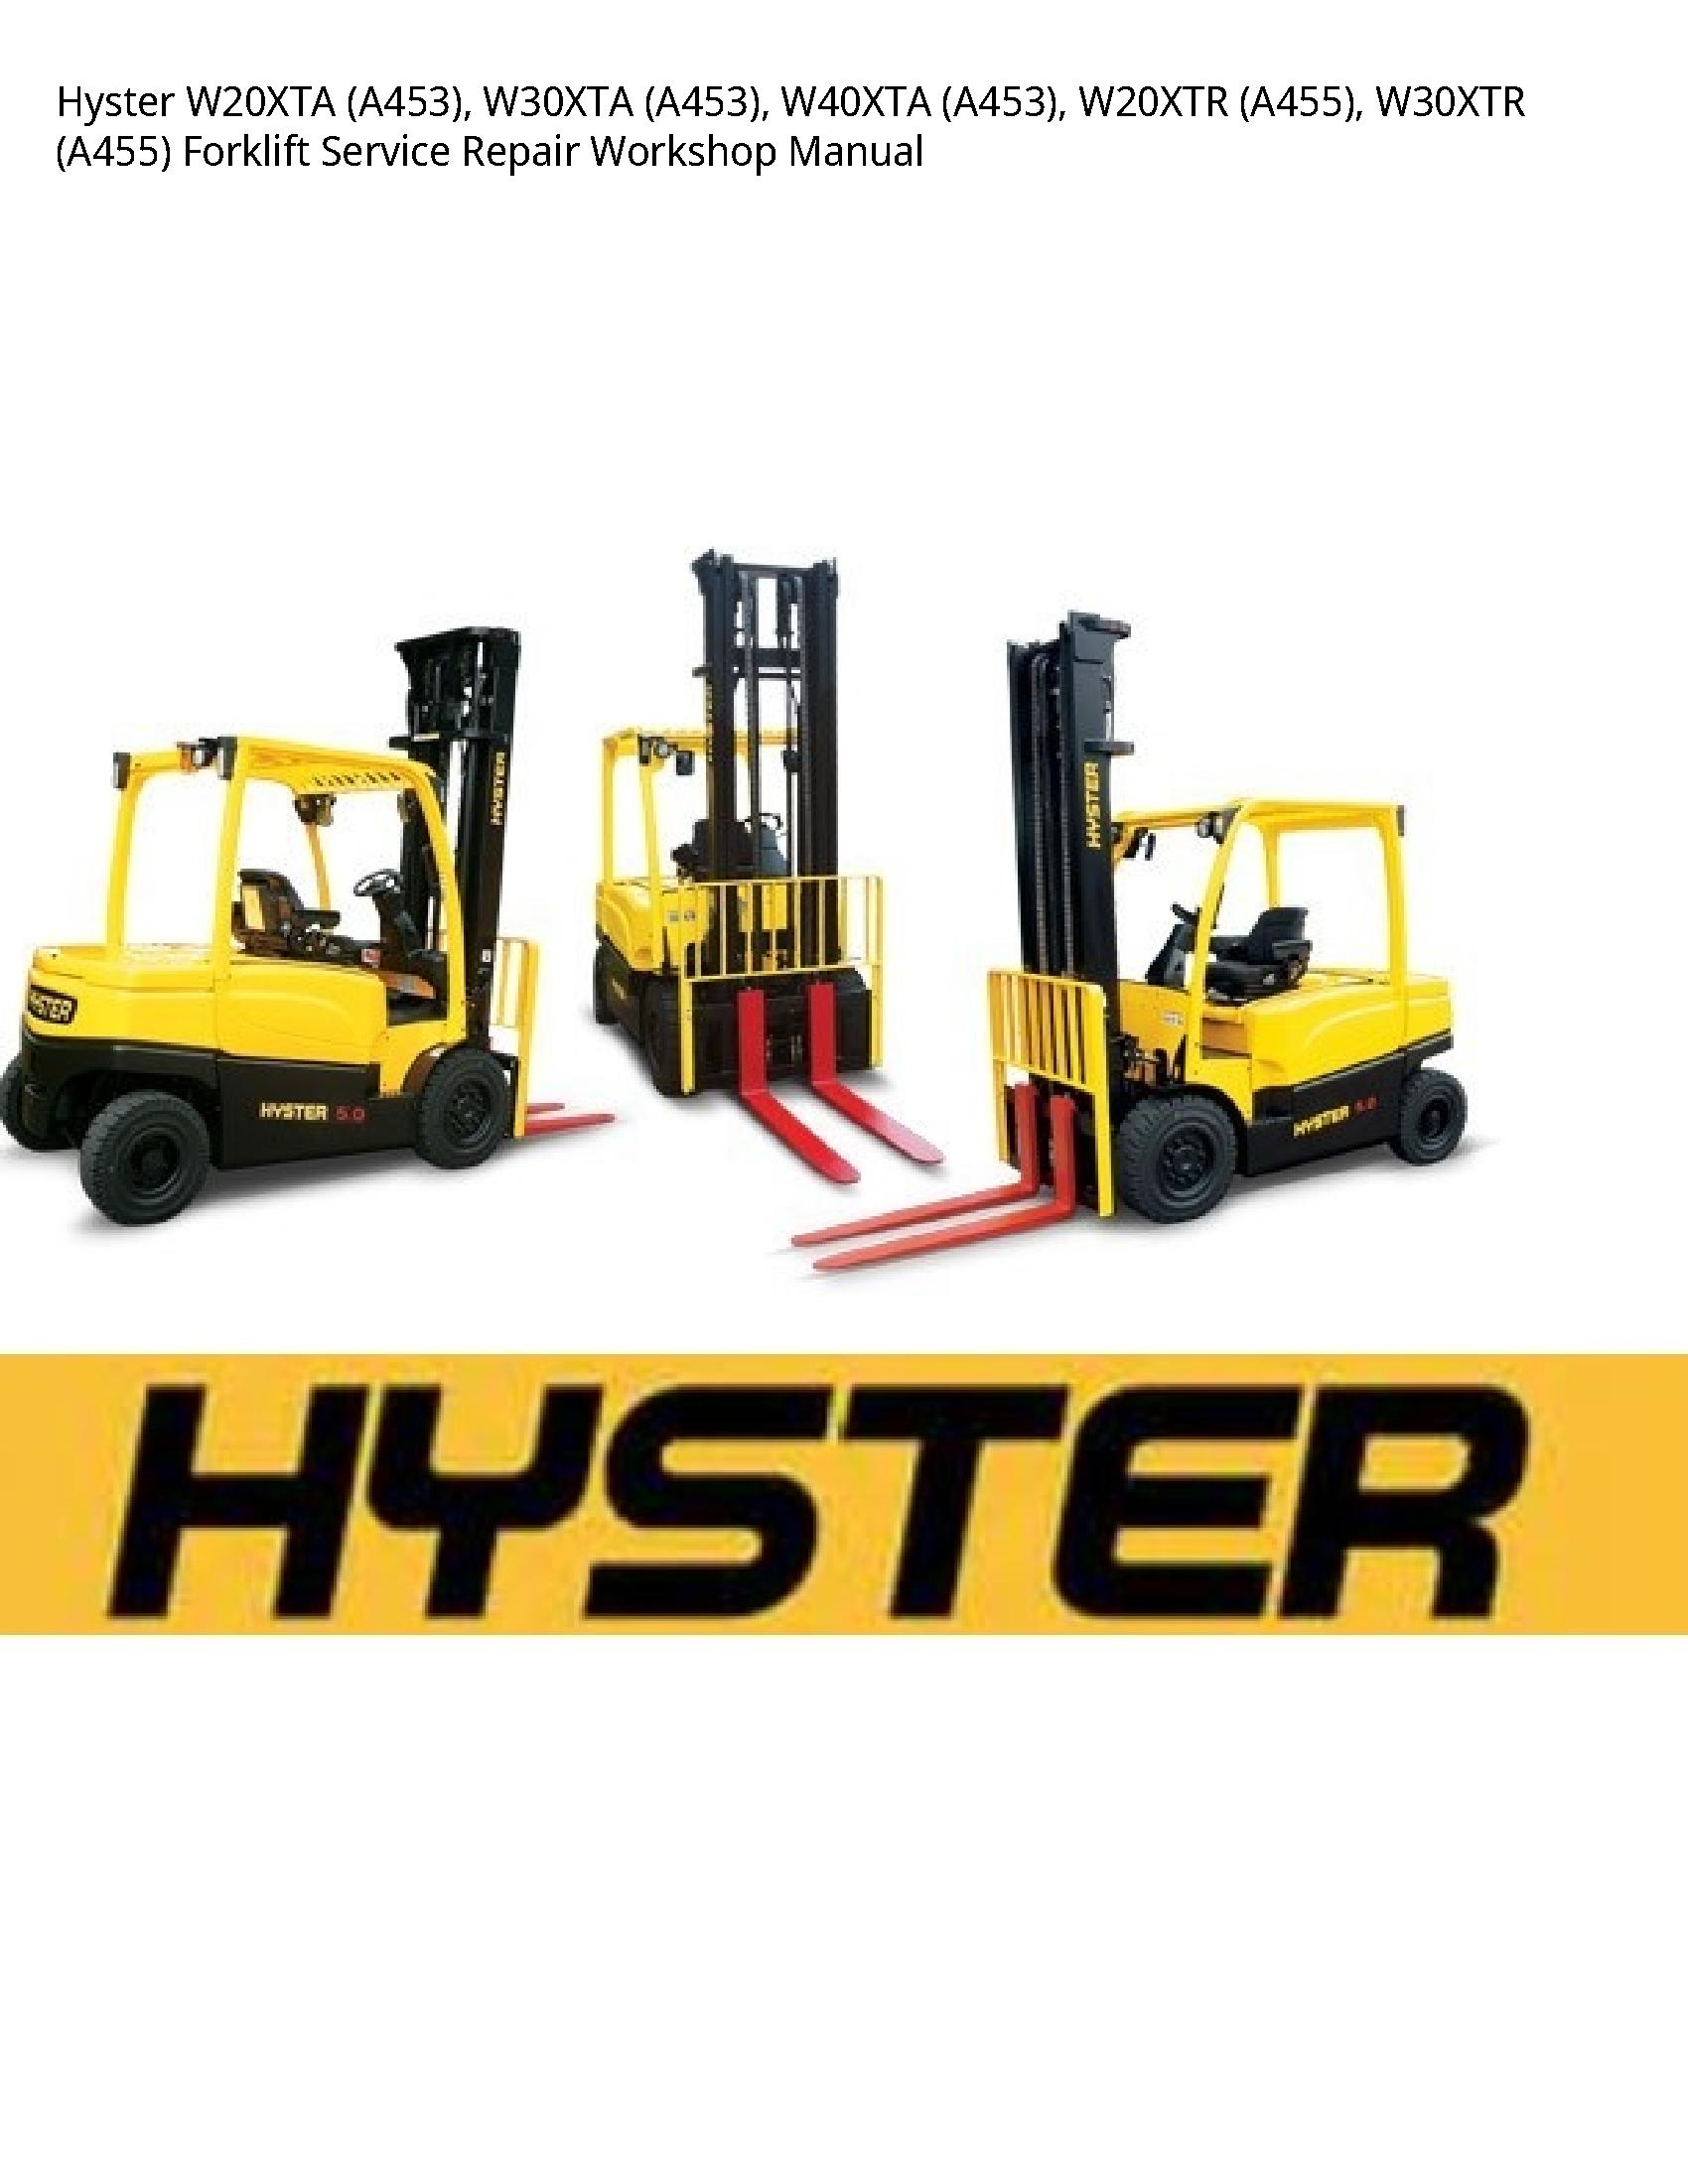 Hyster W20XTA Forklift manual